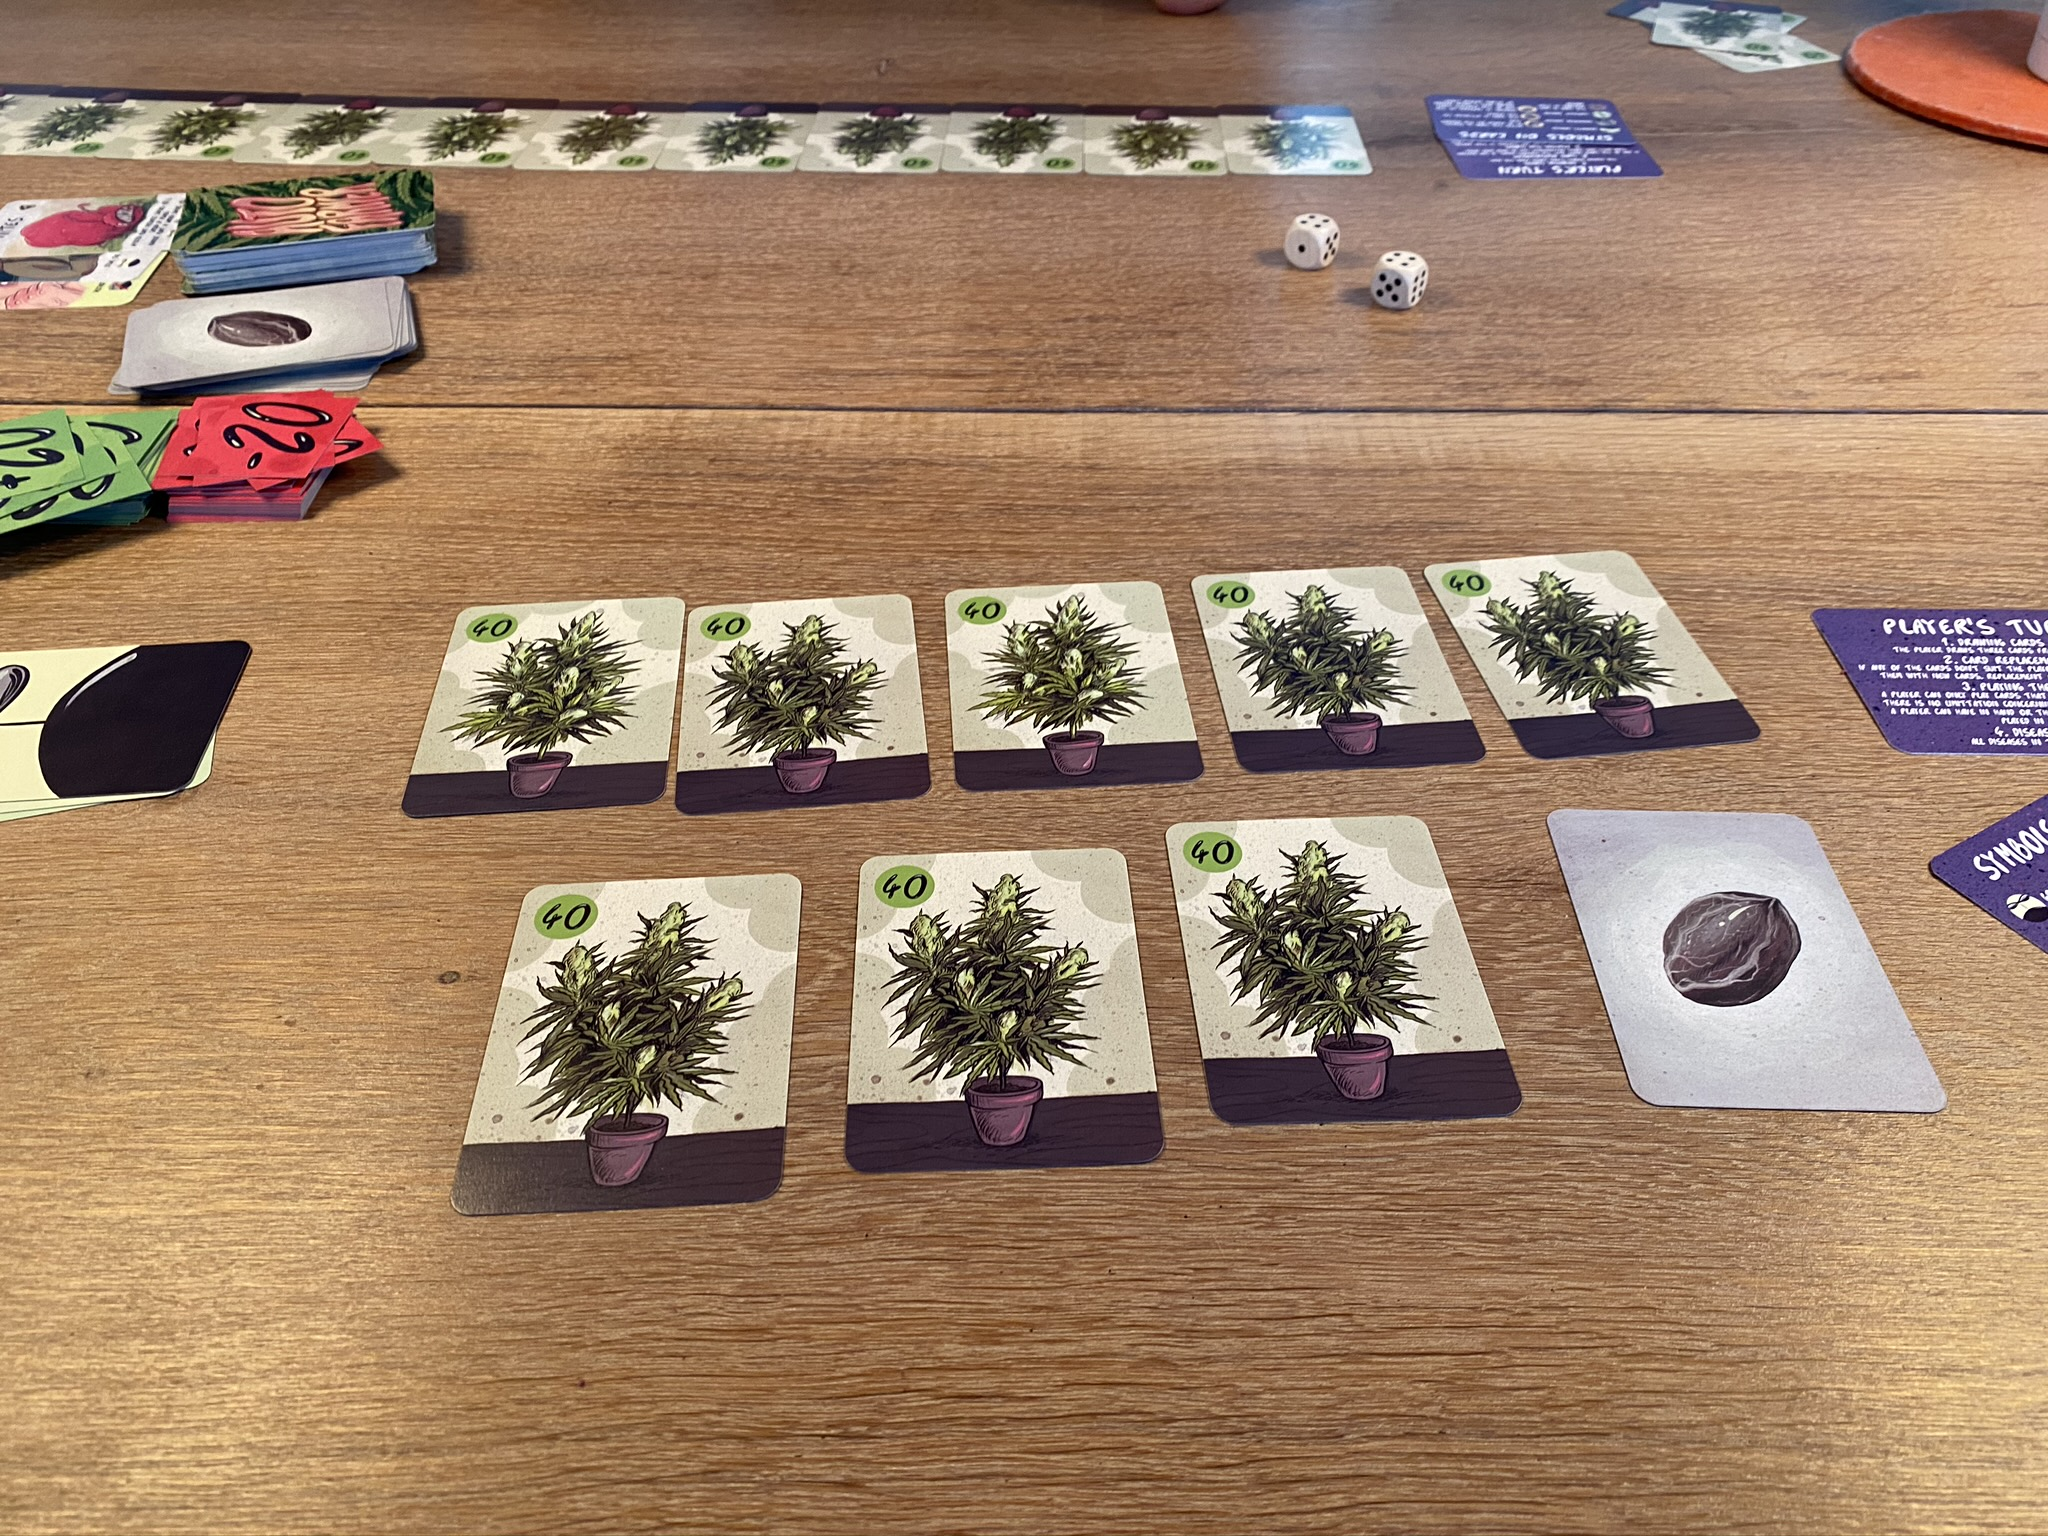 2 player setup - lucky bunch of plants